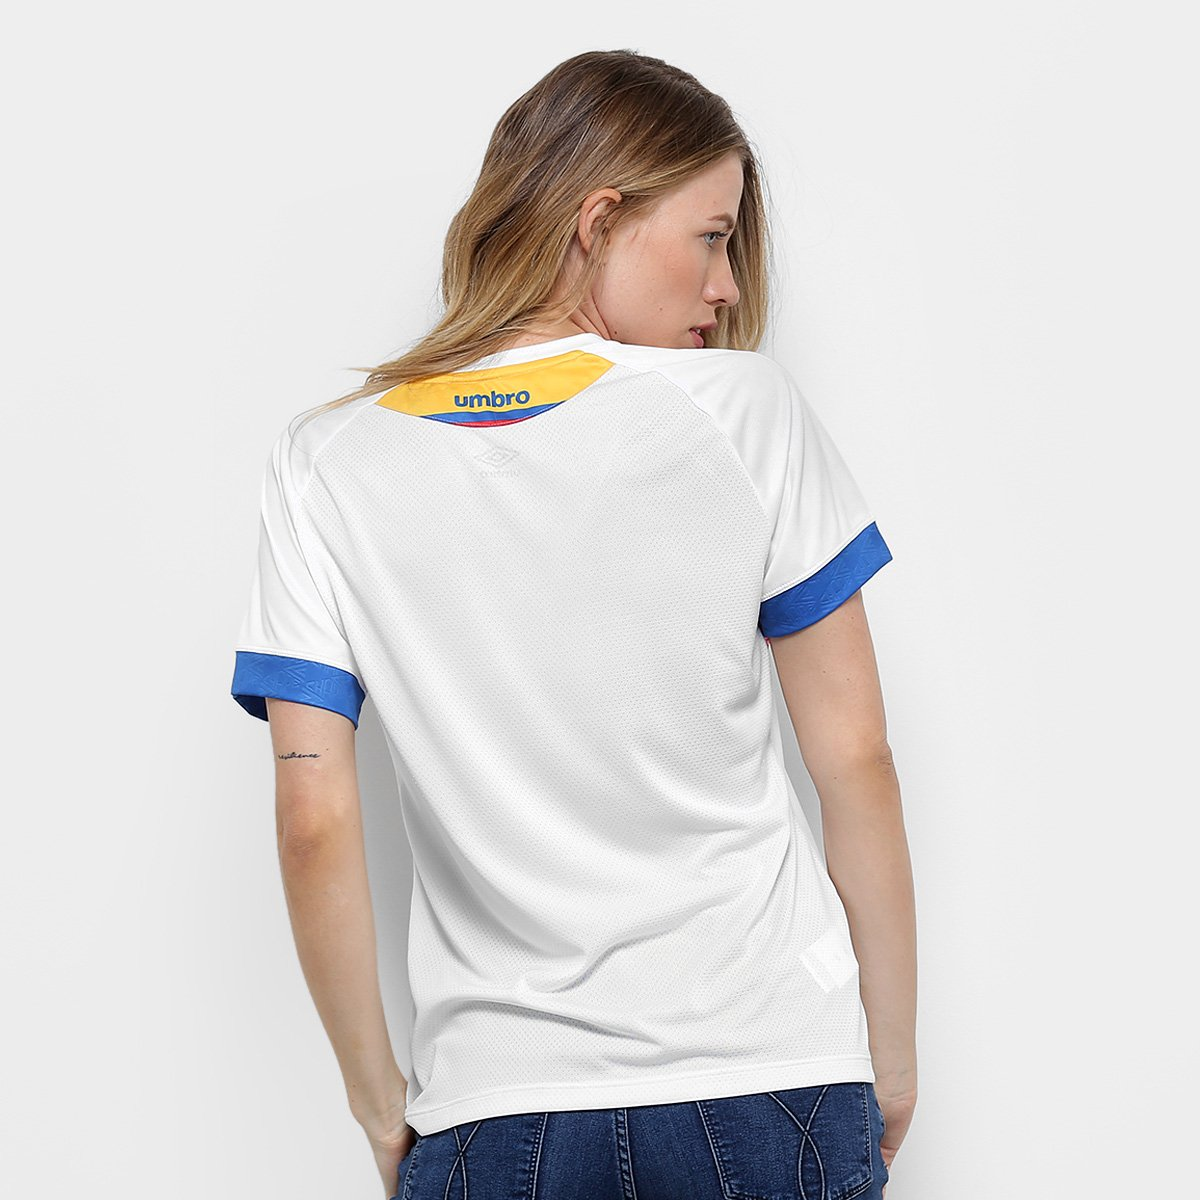 Umbro Camisa Branco Torcedor e Feminina La II Pasion s Azul n° 2018 Chapecoense r8Bapr